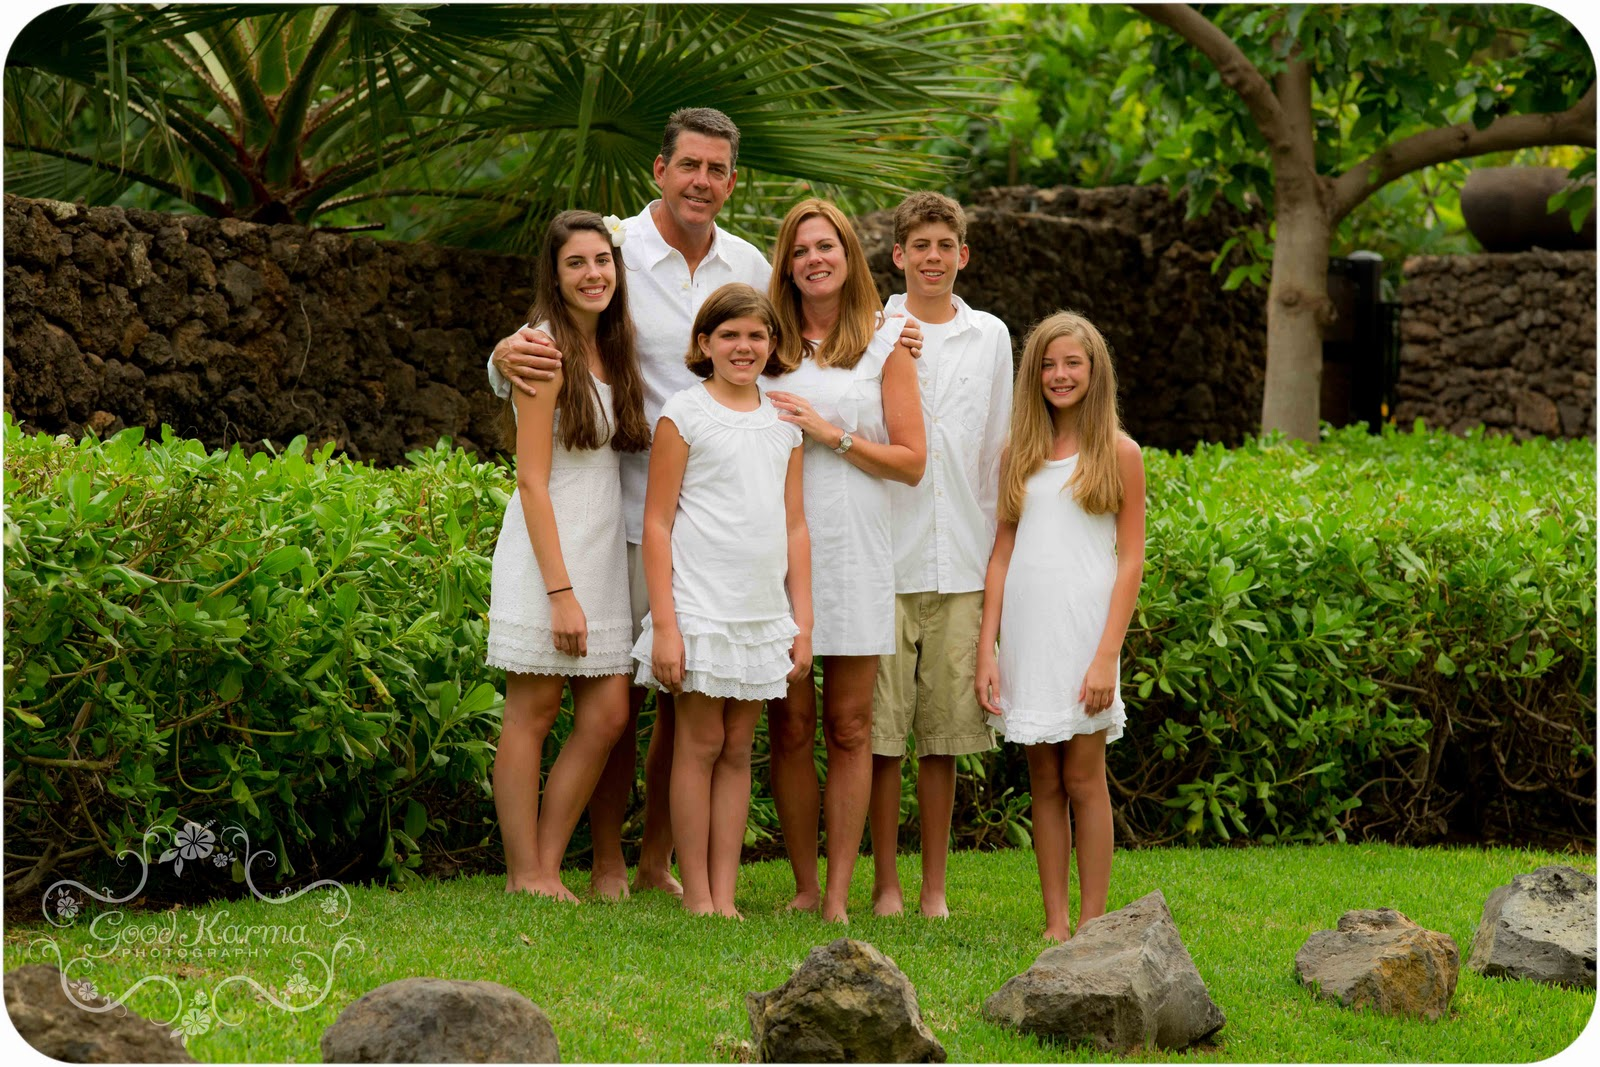 bechtel family net worth